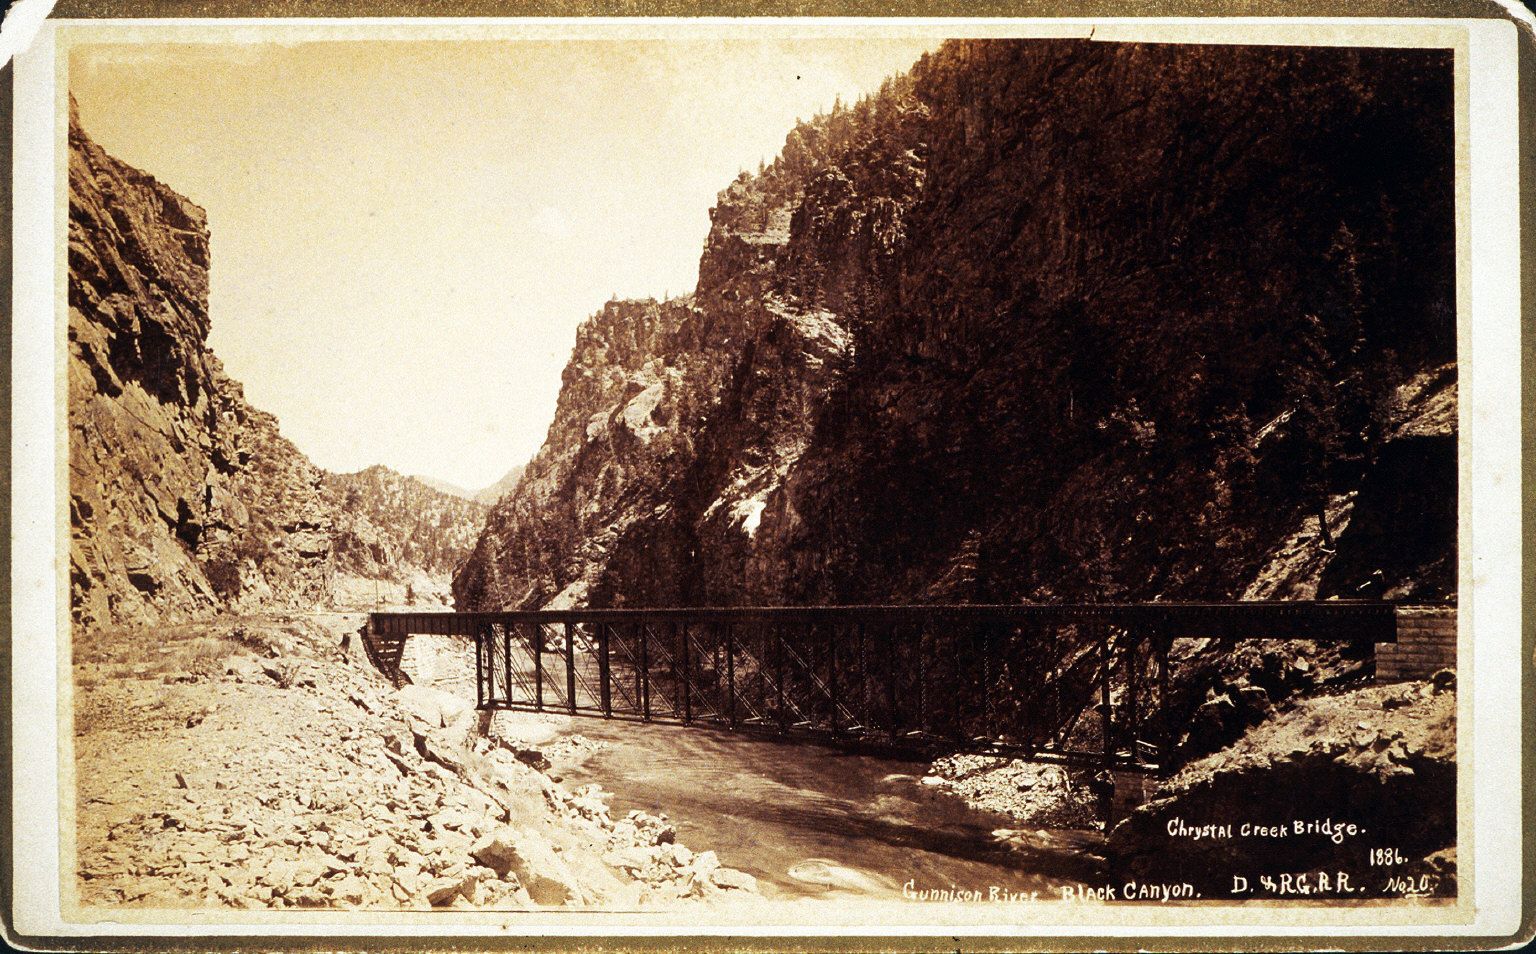 Chrystal Creek Bridge. Gunnison River, Black Canyon. D. & R.G.R.R.